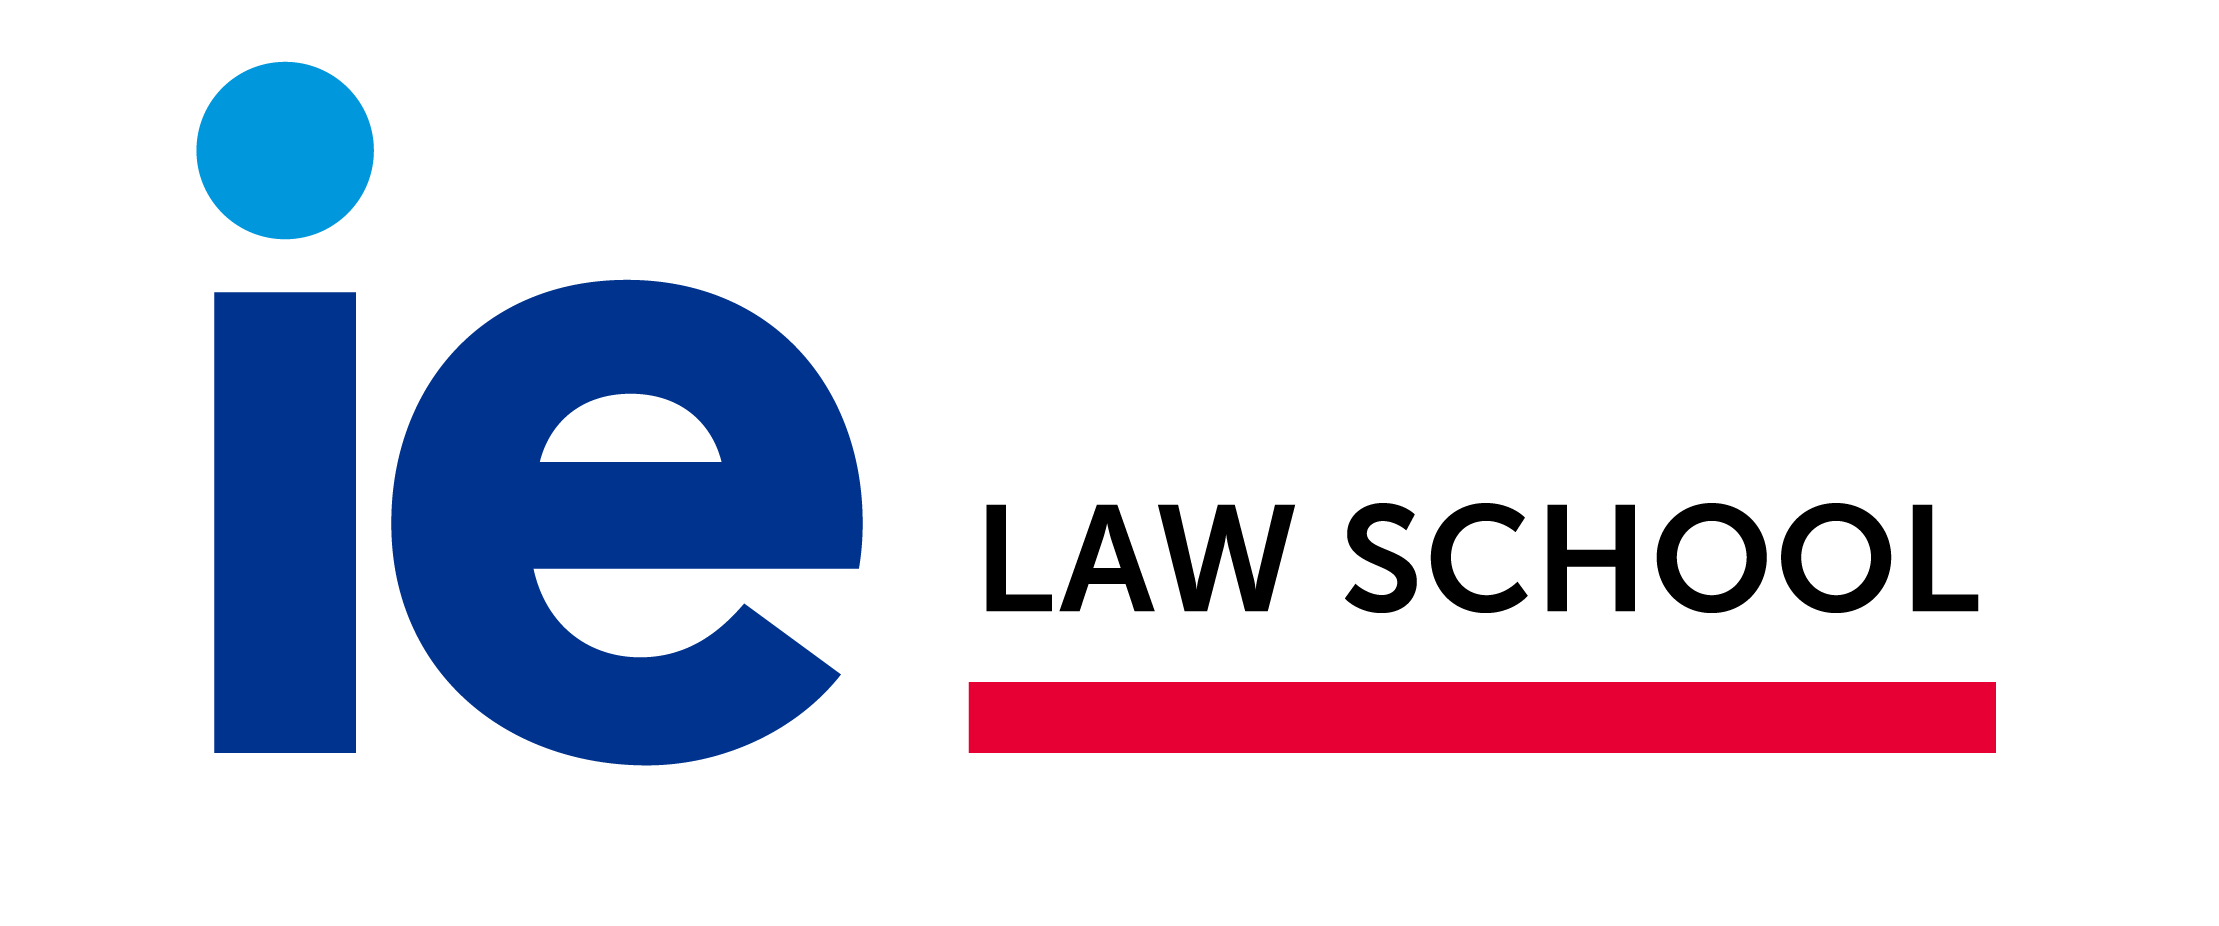 logo IE copia